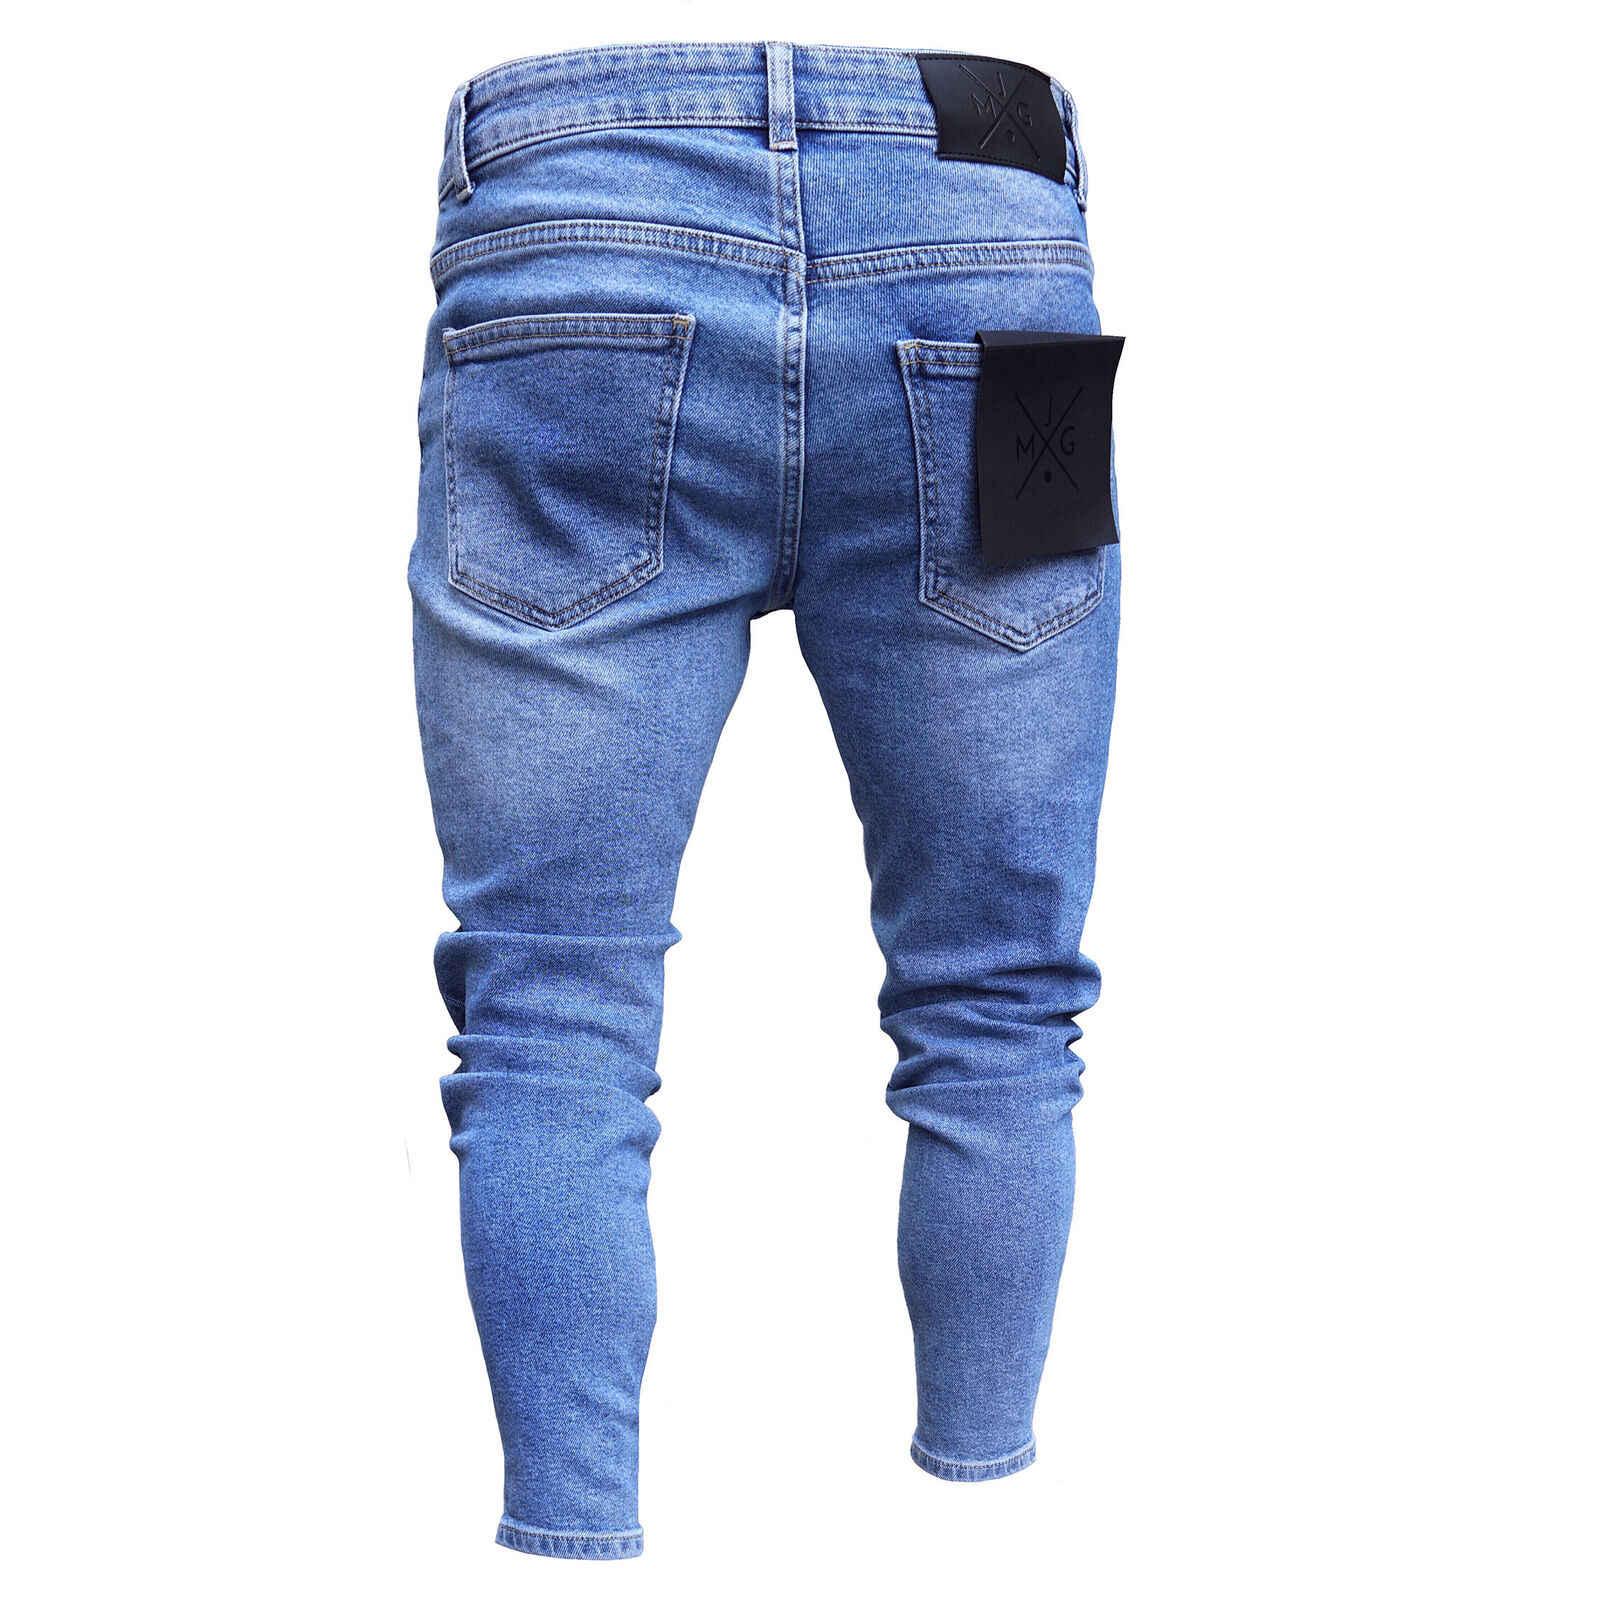 Männer Kleidung 2020 Hüfte Hop Jogginghose Dünne Motorrad Denim Hosen Zipper Designer Schwarze Jeans Herren Casual Männer Jeans Hosen